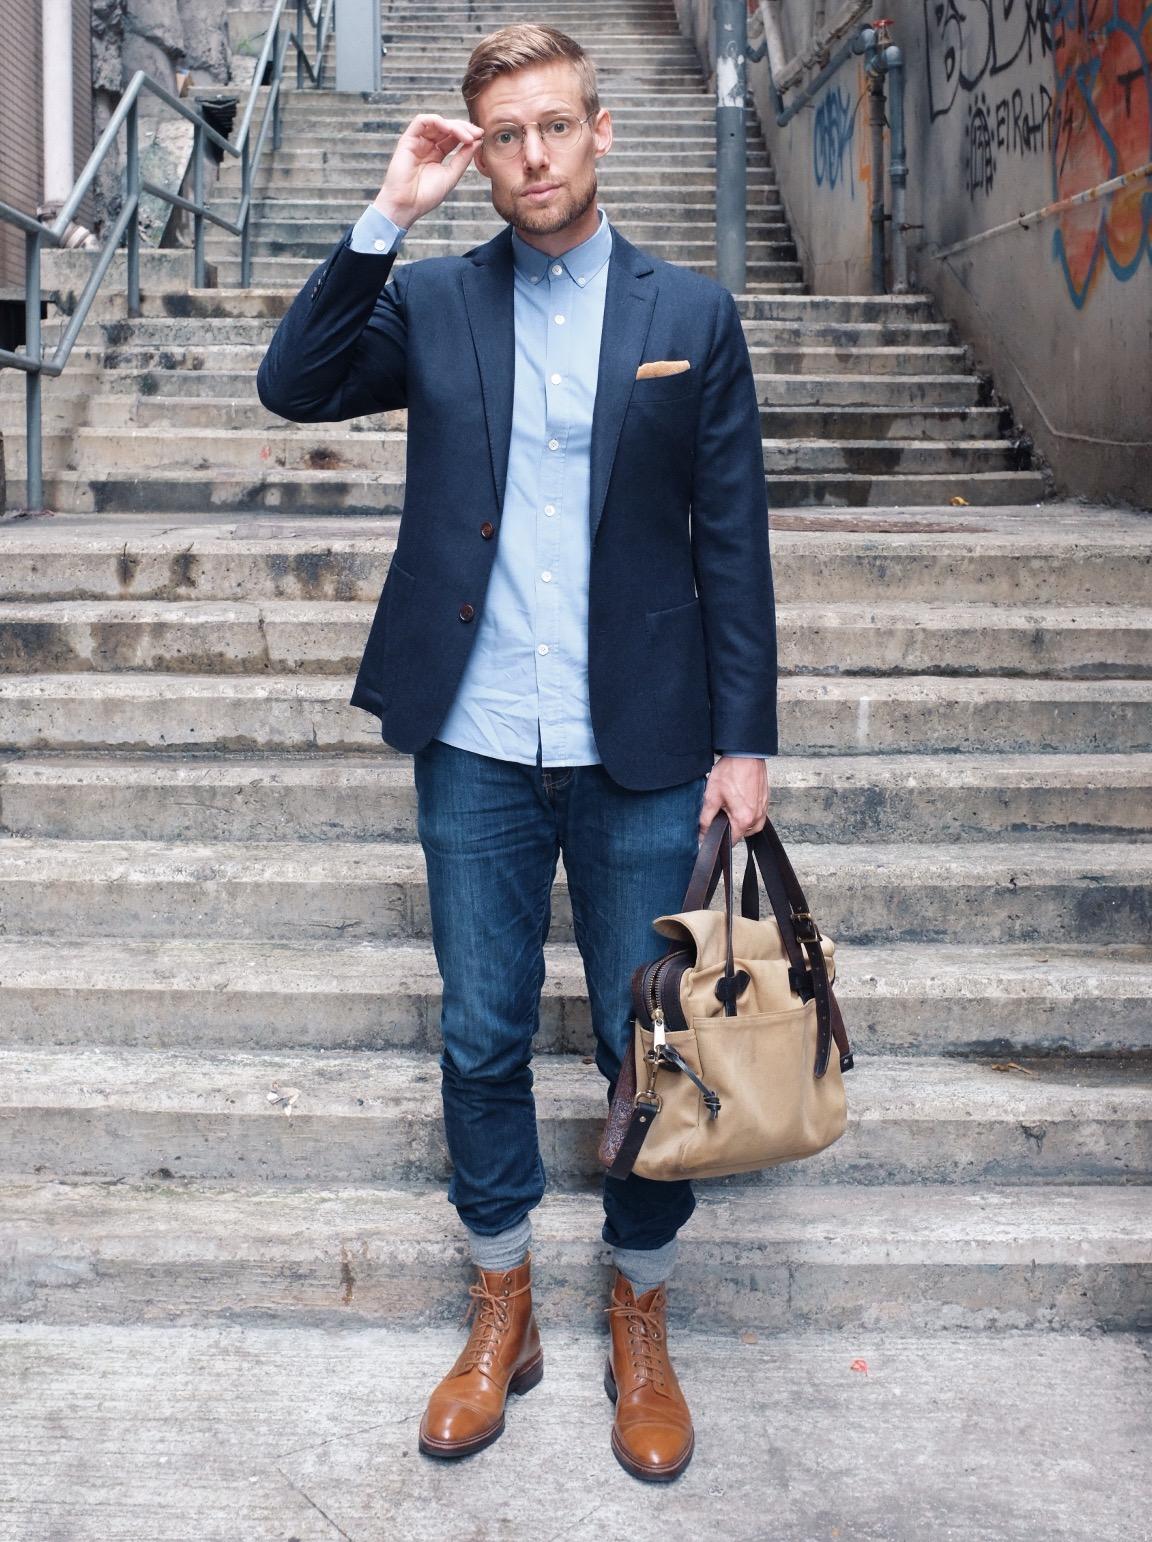 oad_SF_wearing today_denim-socks-casual_2.JPG